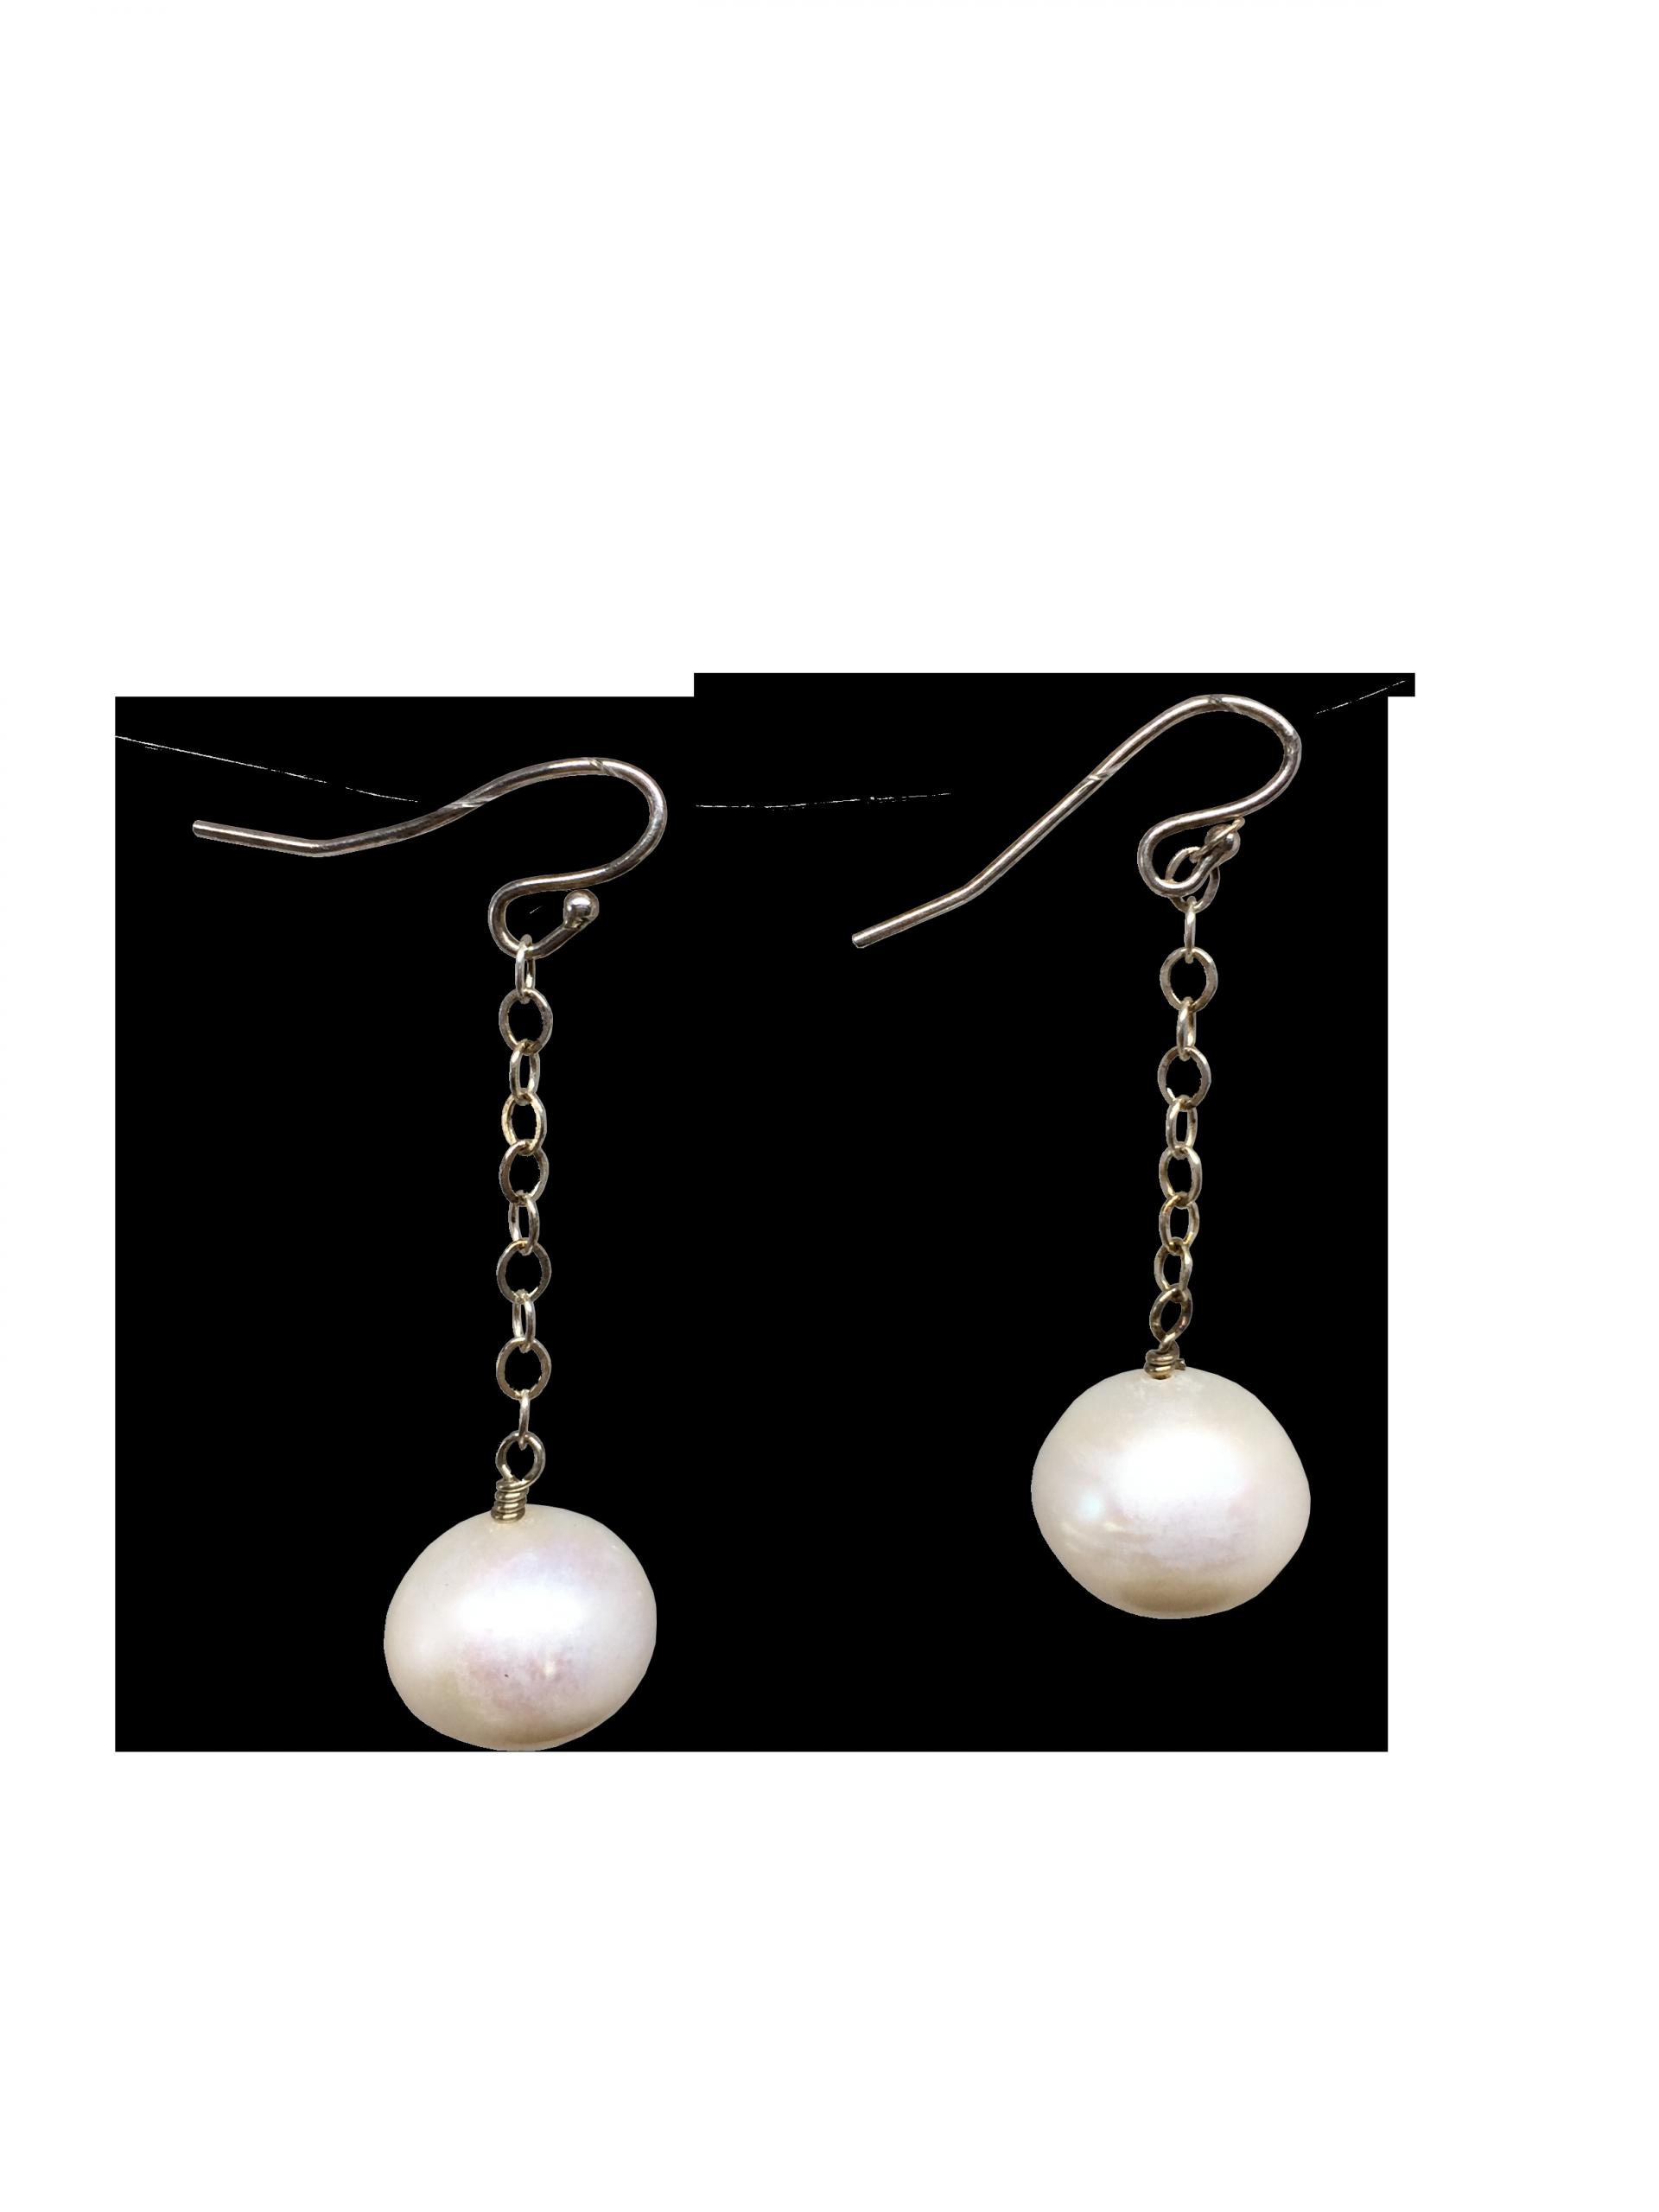 Pearl Drop Earrings  Sterling Silver Pearl Earrings 10 mm Round Drop Earrings